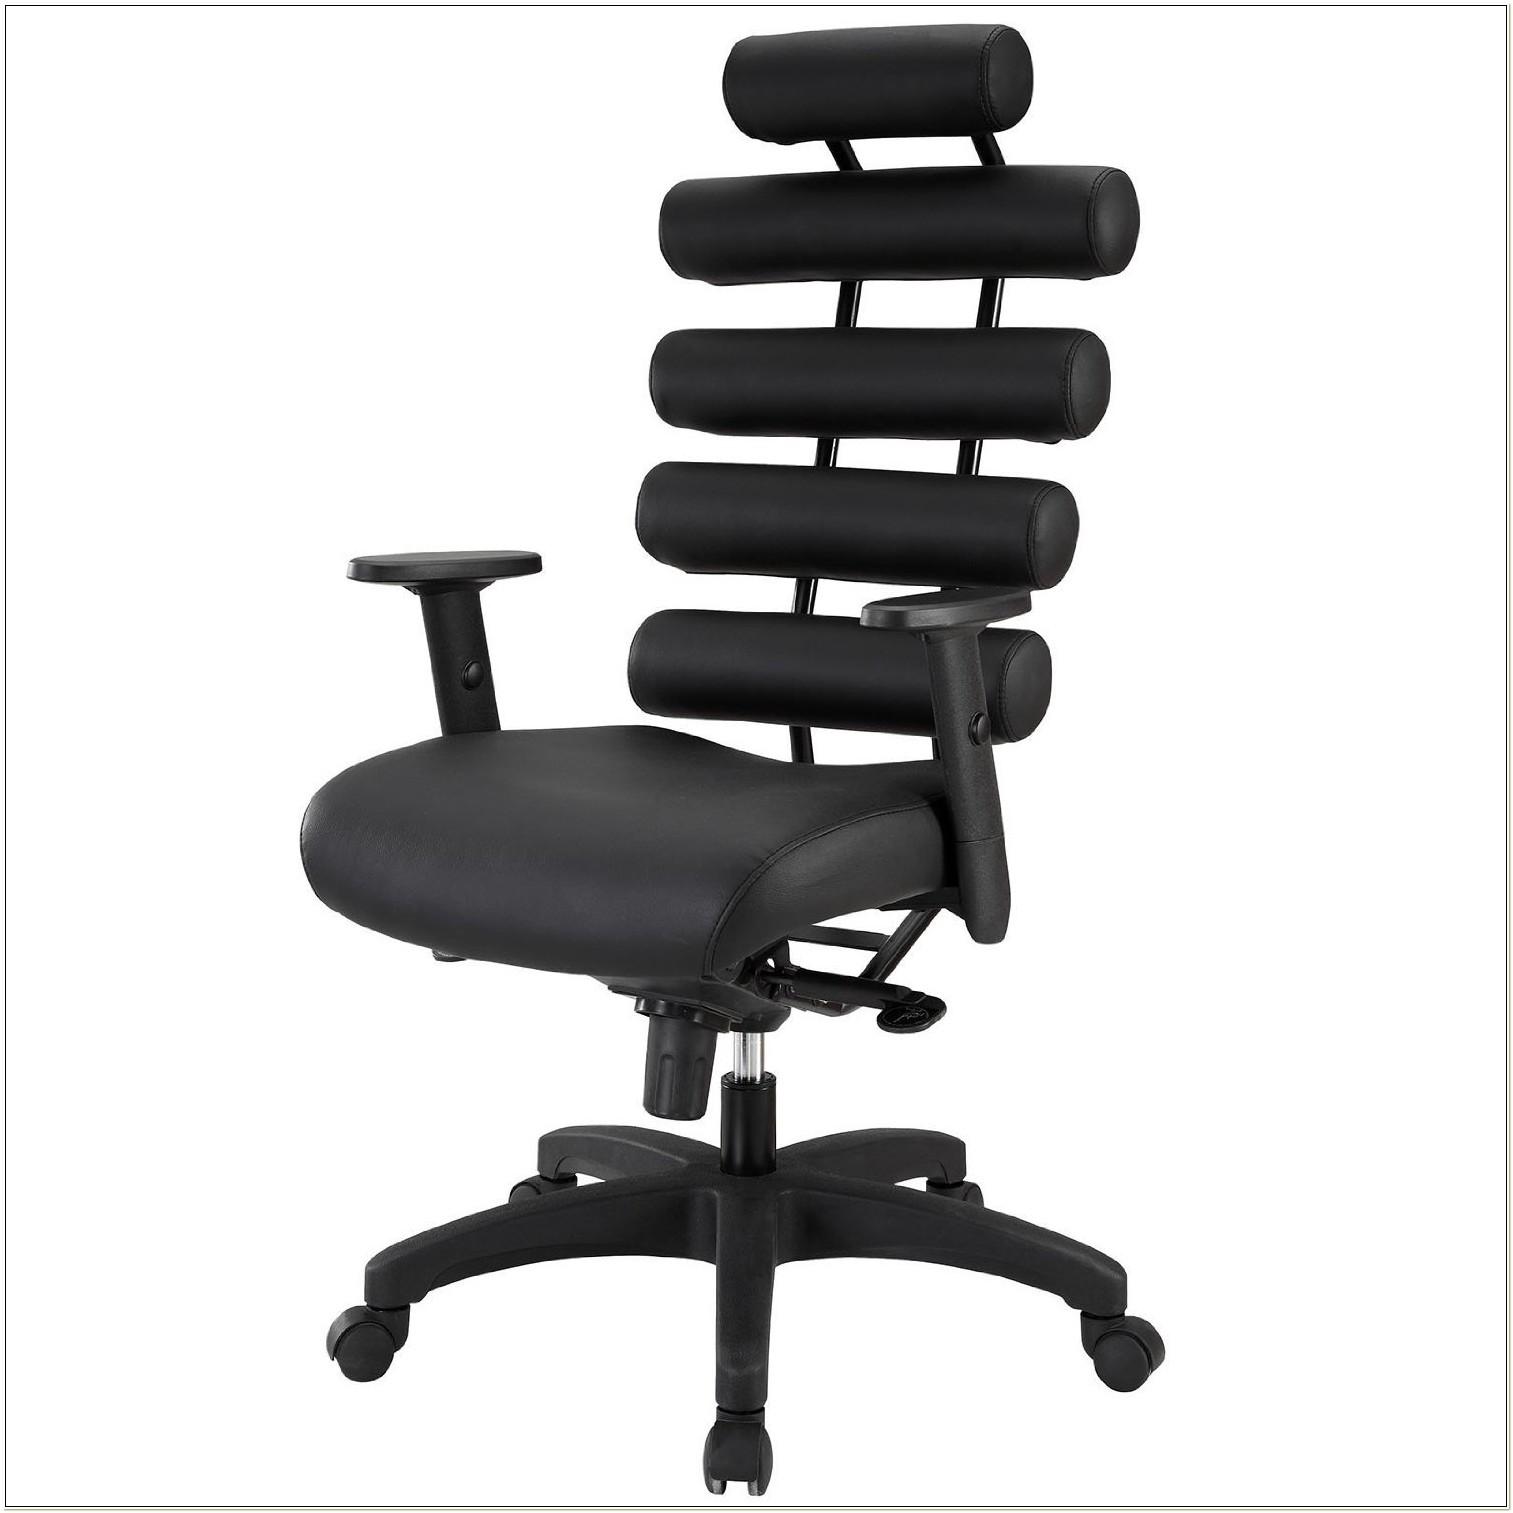 Best Desk Chair For Sciatica